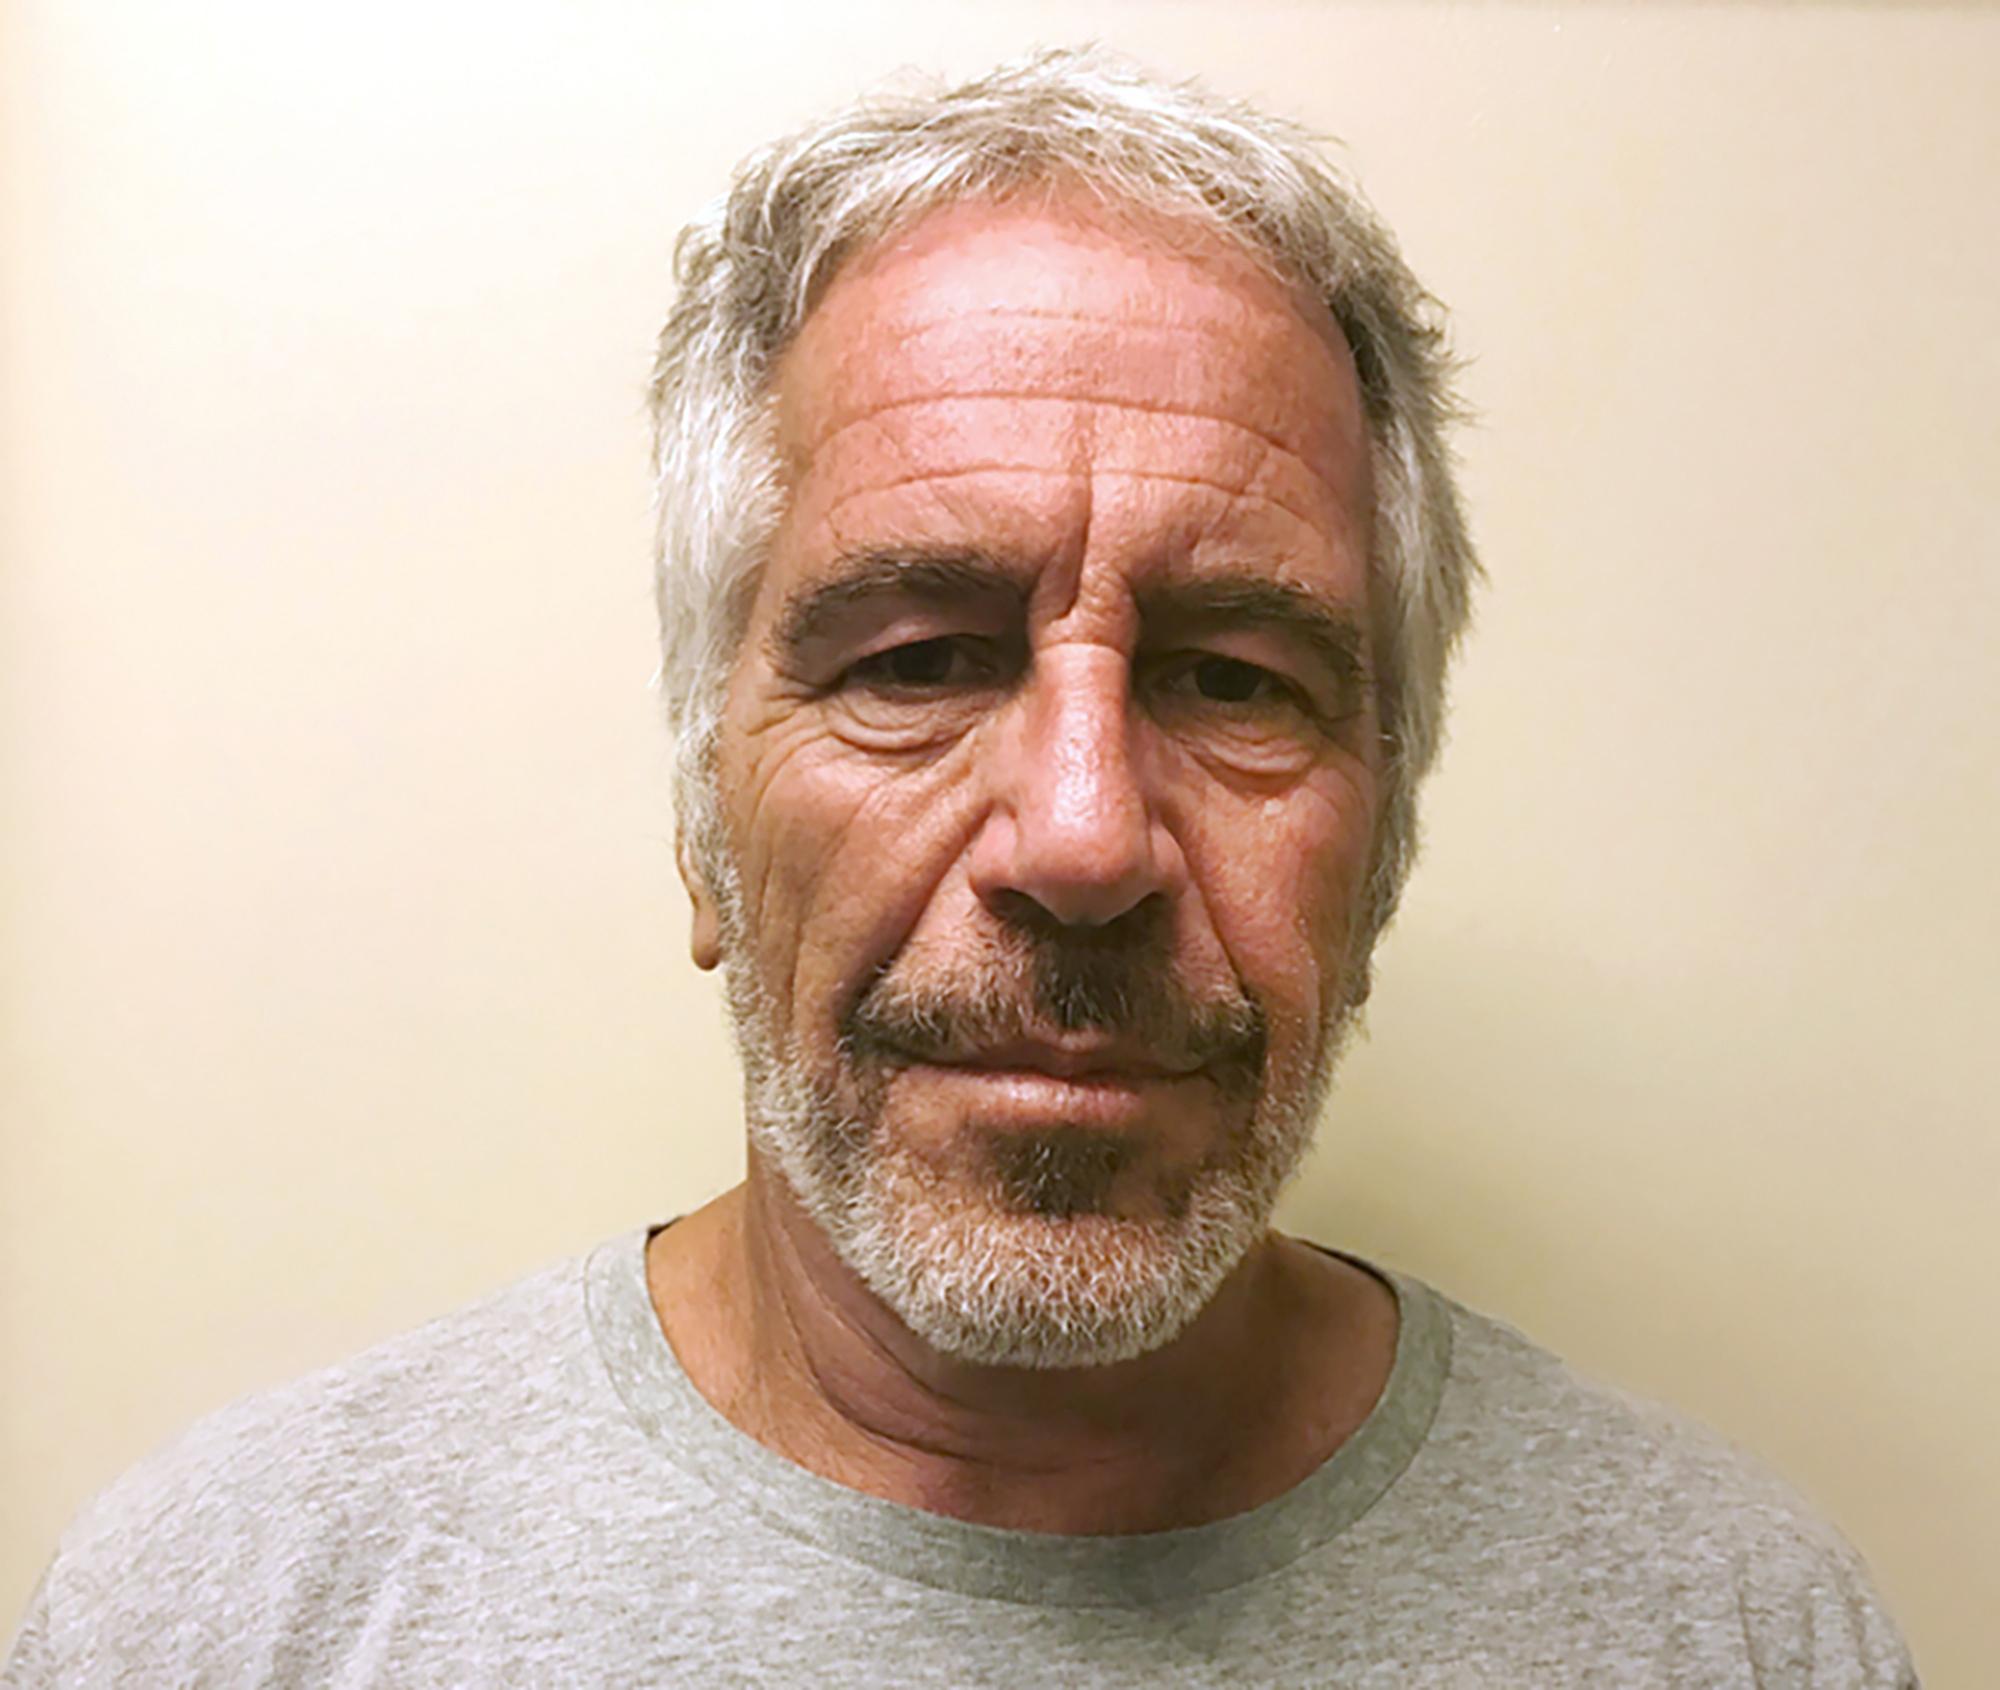 Epstein faced 2nd probe, seen with underage girls in 18